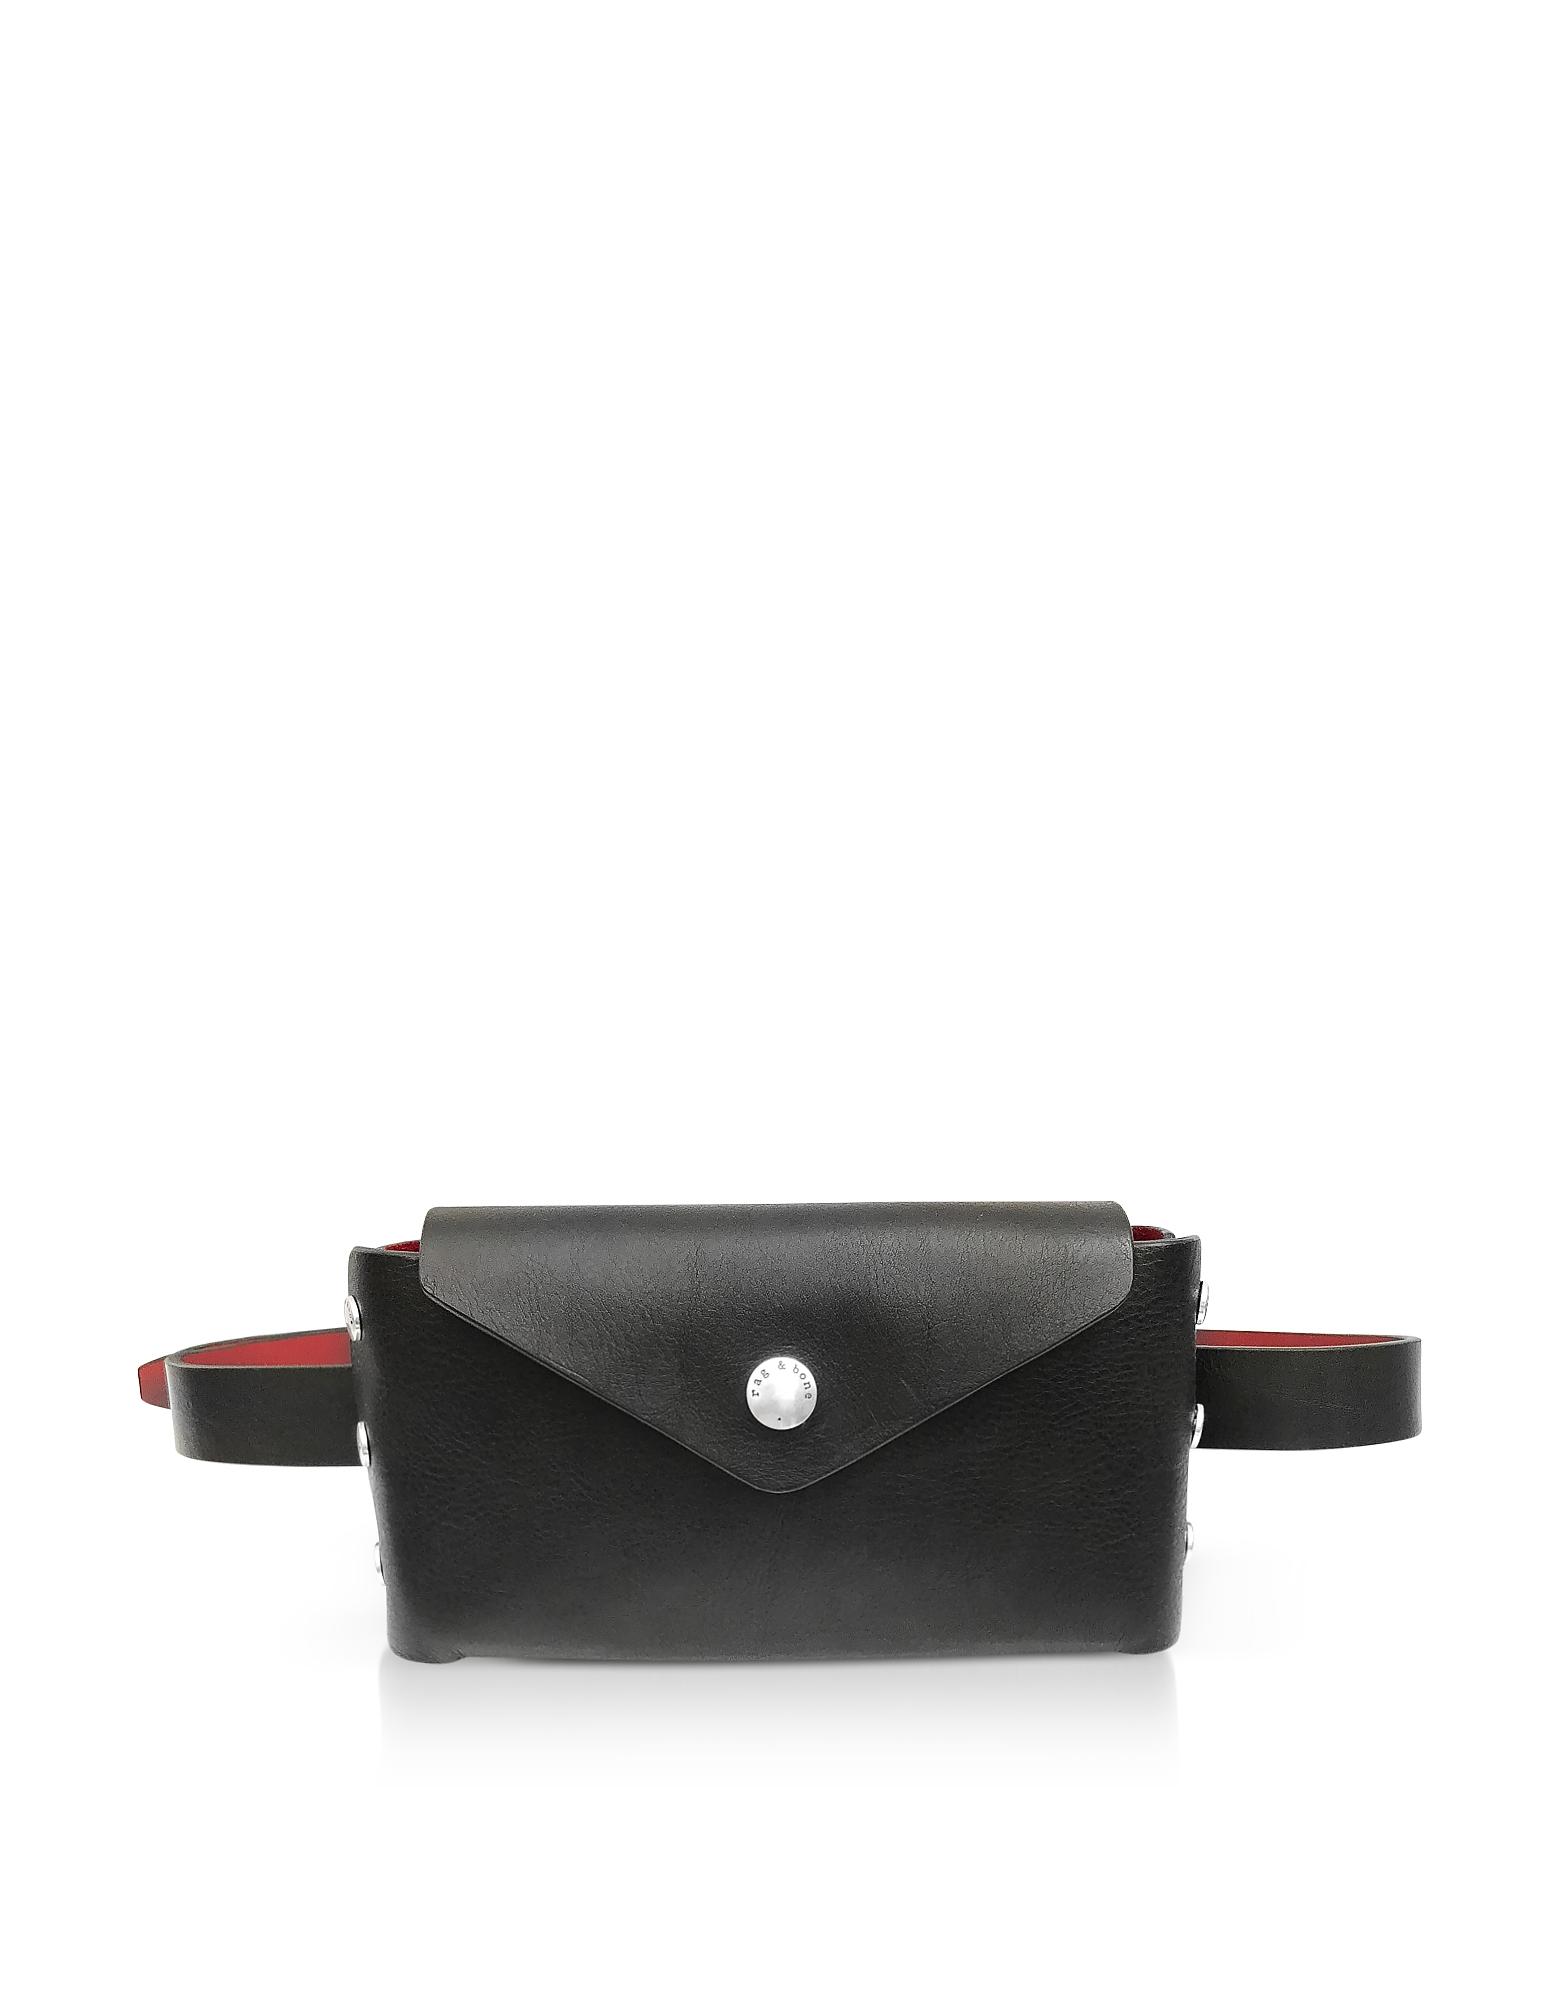 Small/Medium Color Block Leather Atlas Belt Bag in Black/ Biking Red